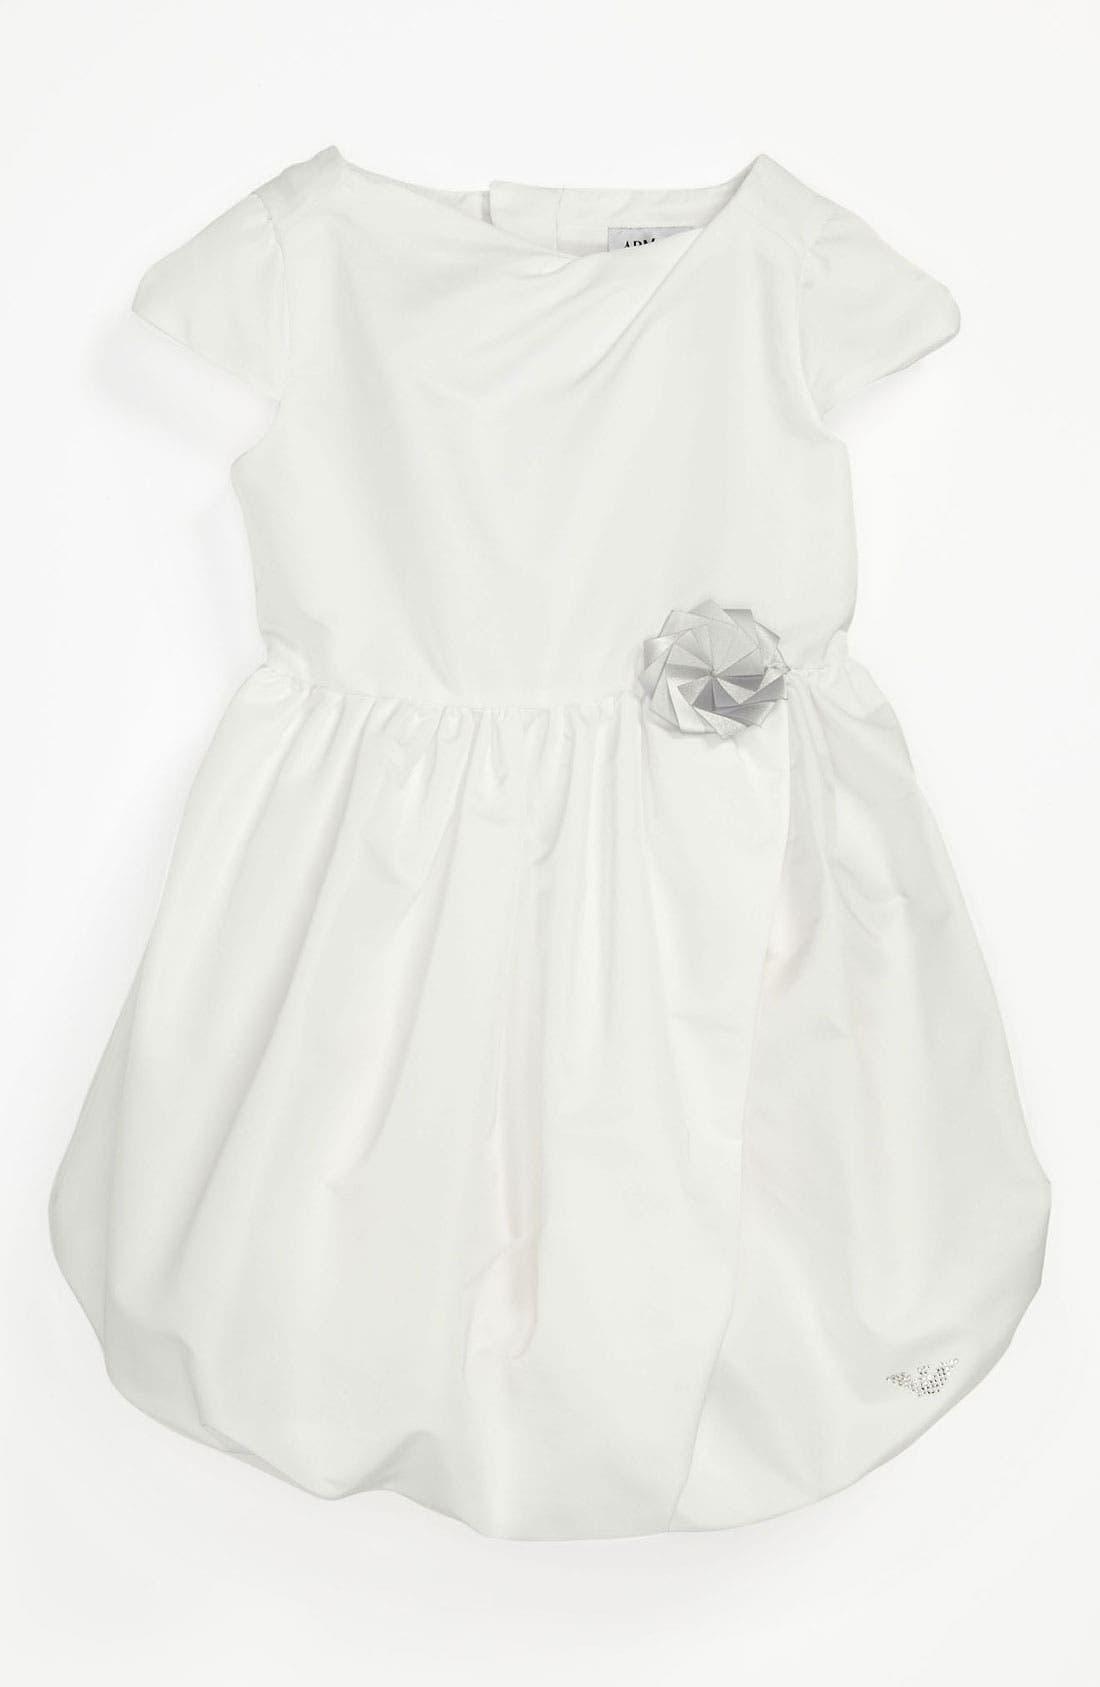 Alternate Image 1 Selected - Armani Junior Dress (Toddler Girls)